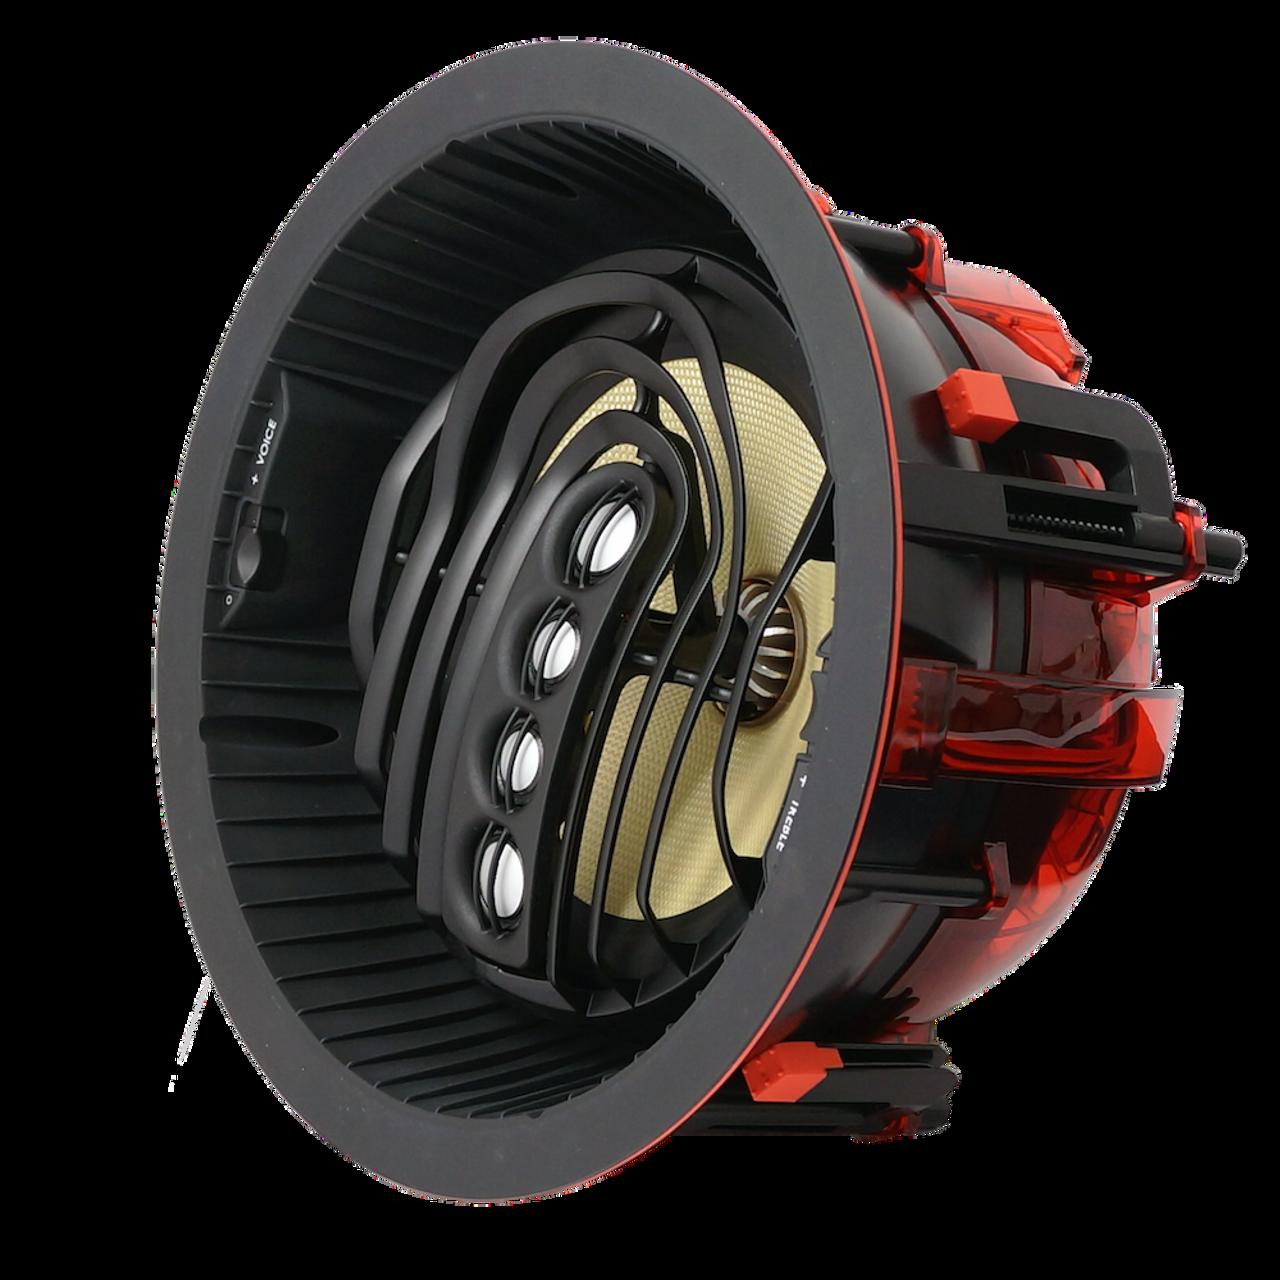 Aim 255 SpeakerCraft AIM 5 FIVE Series 2 In-Ceiling Speaker